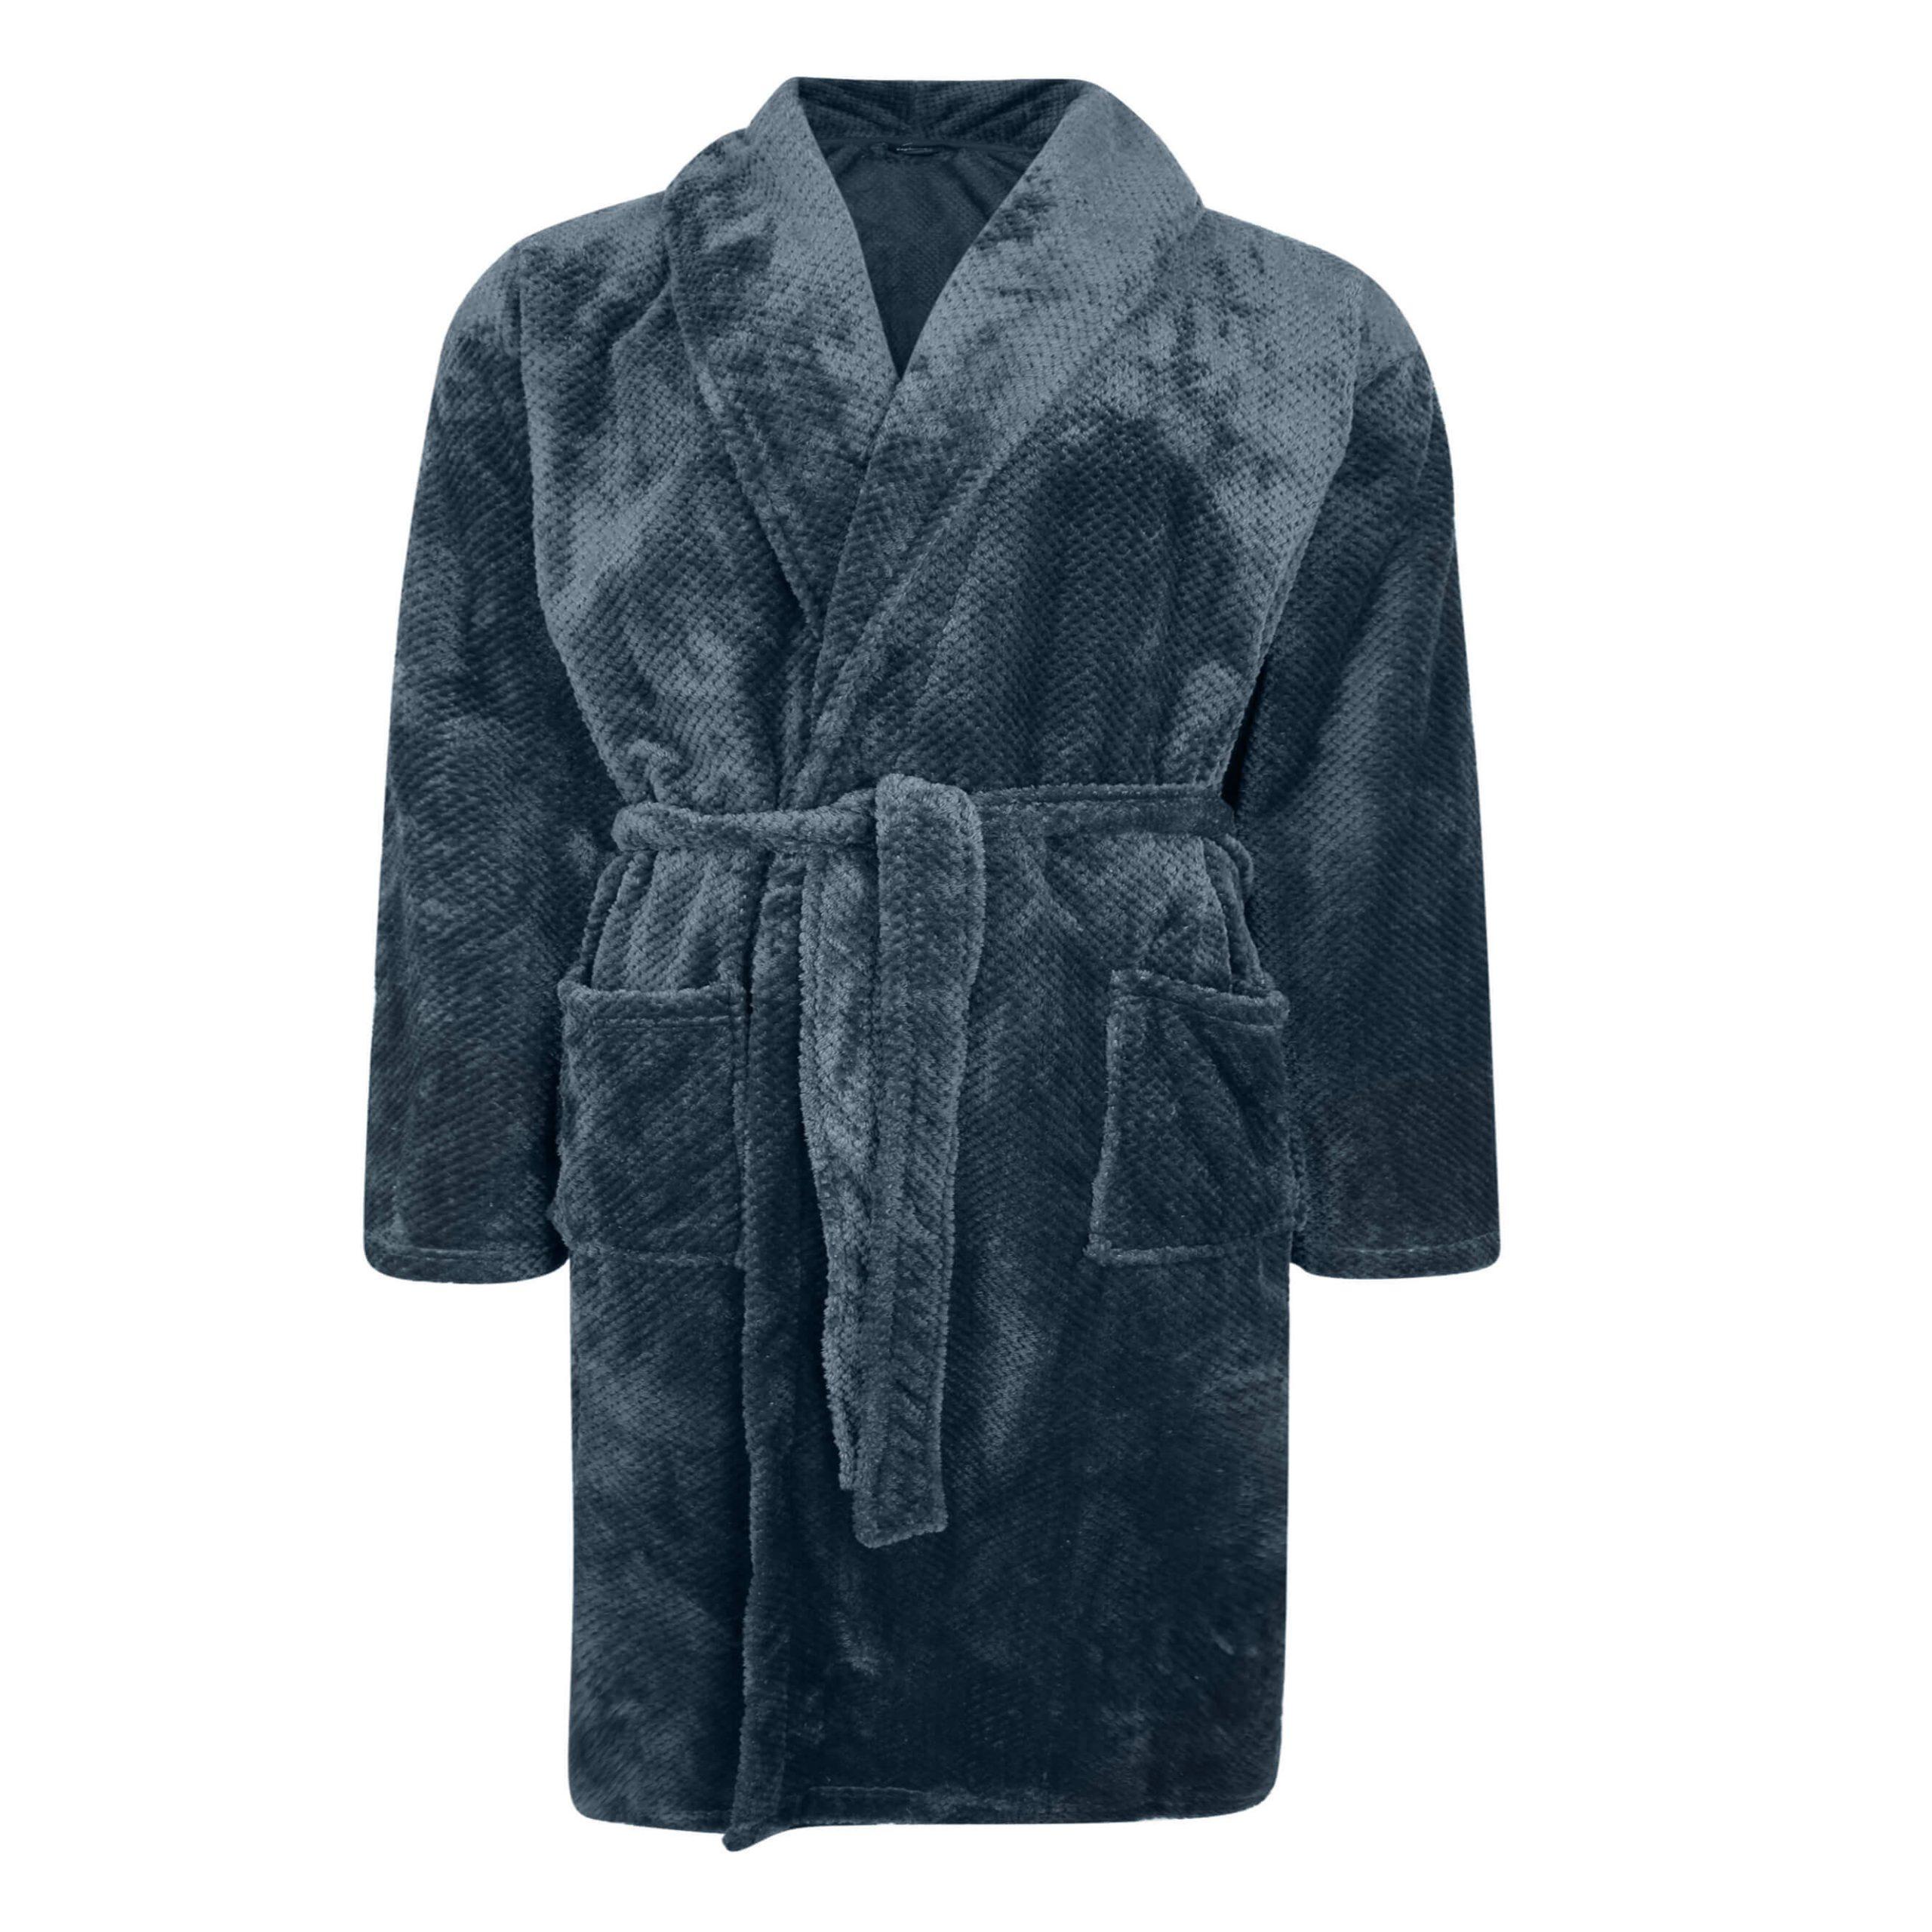 Espionage Microfleece Dressing Gown